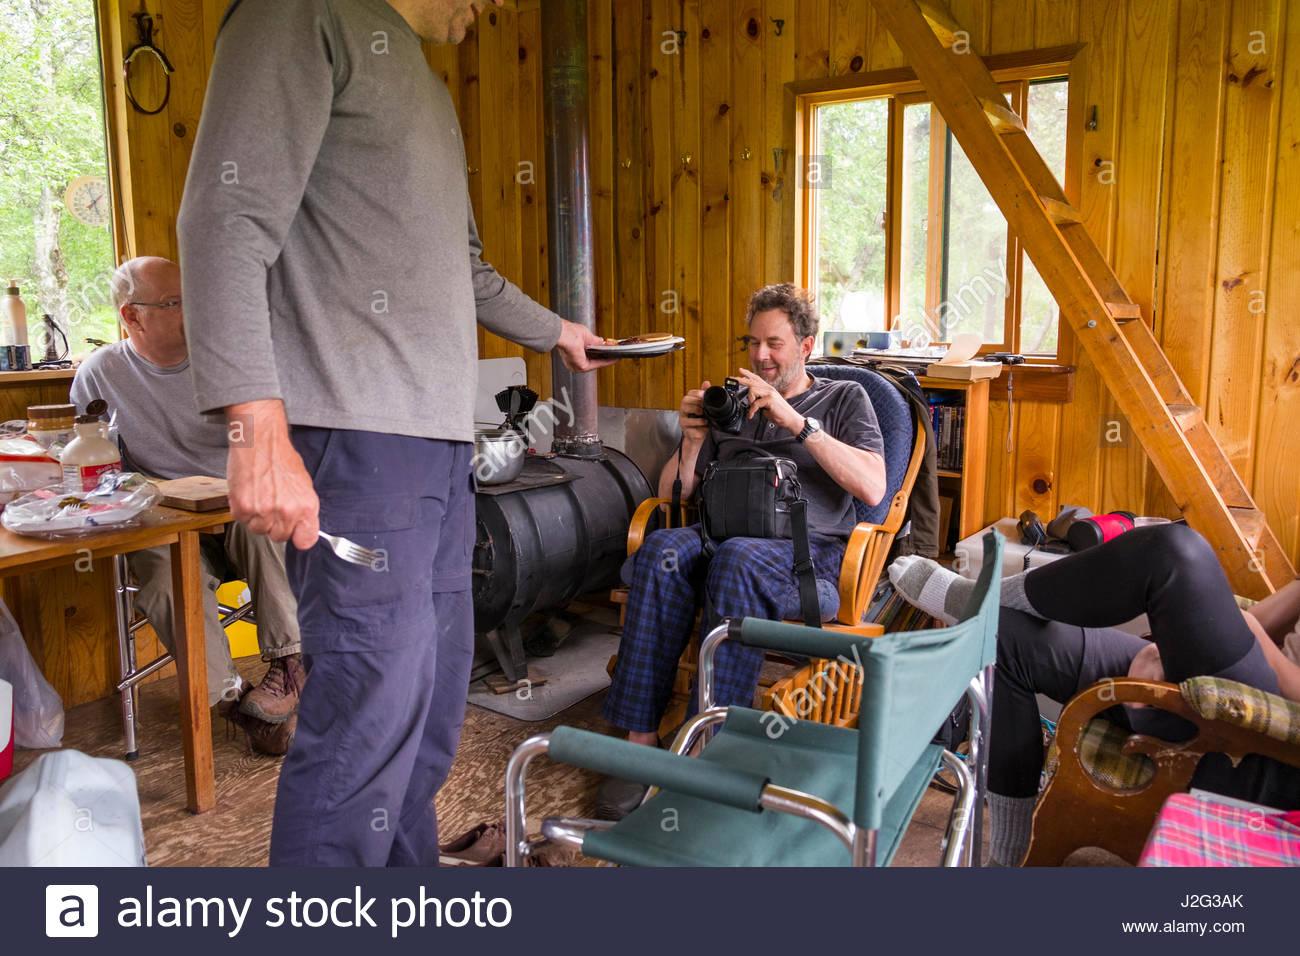 Alaska matanuska susitna county talkeetna - Men Inside Remote Off Grid Alaskan Cabin Talkeetna Mountains Matanuska Susitna